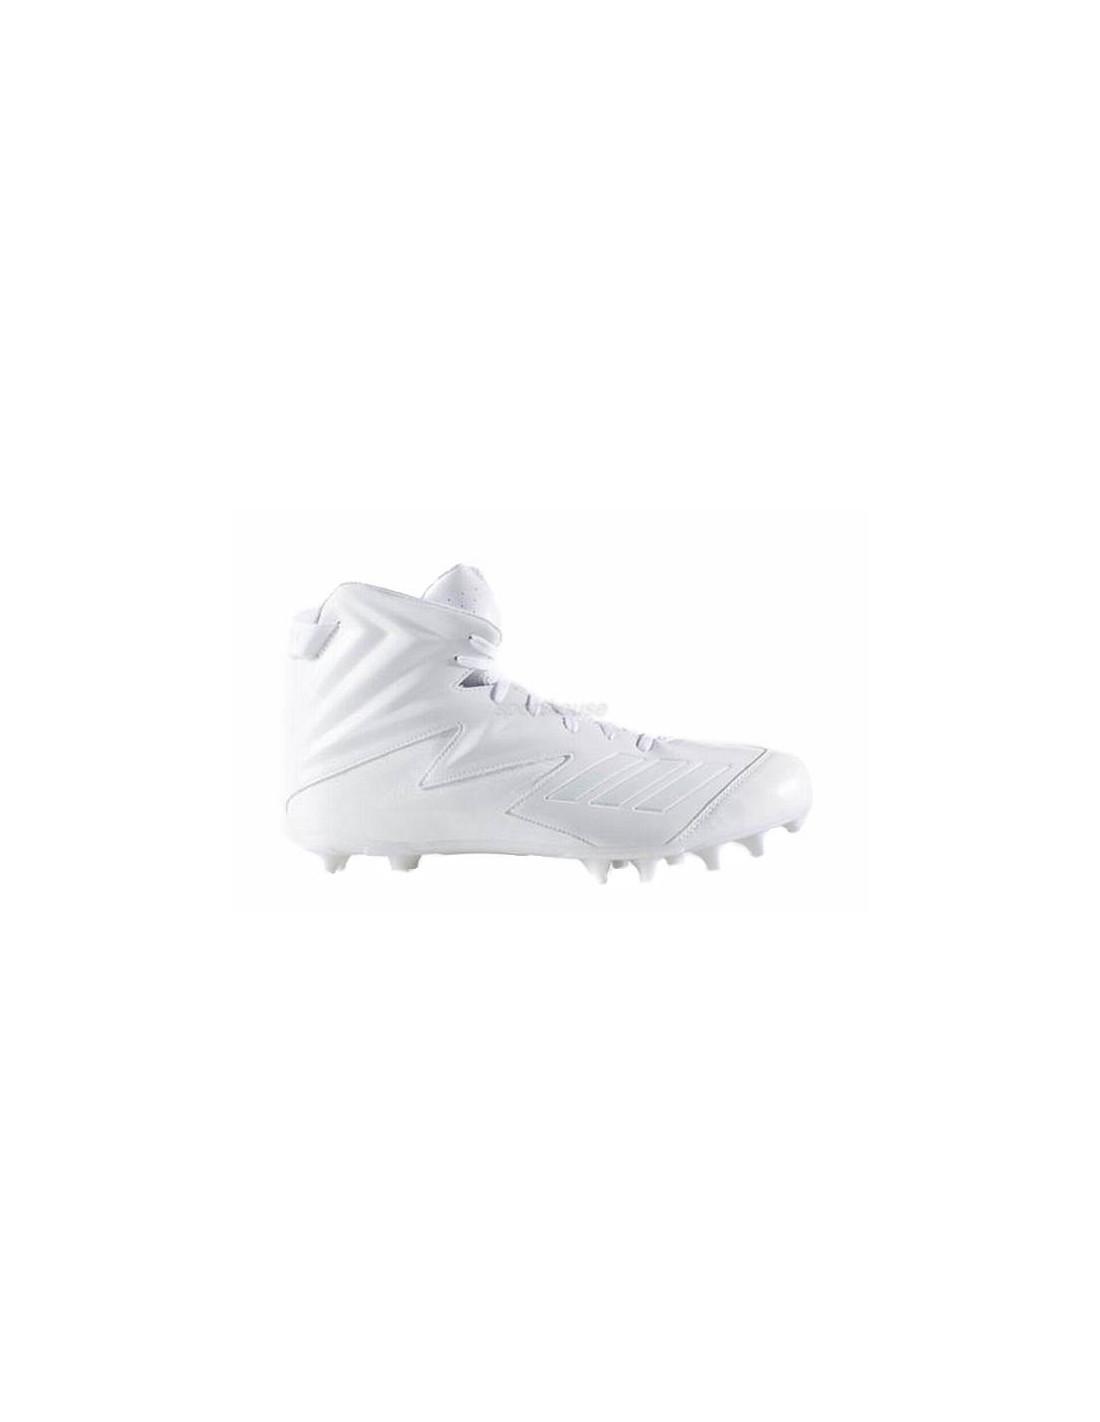 Adidas Freak High Wide White Football